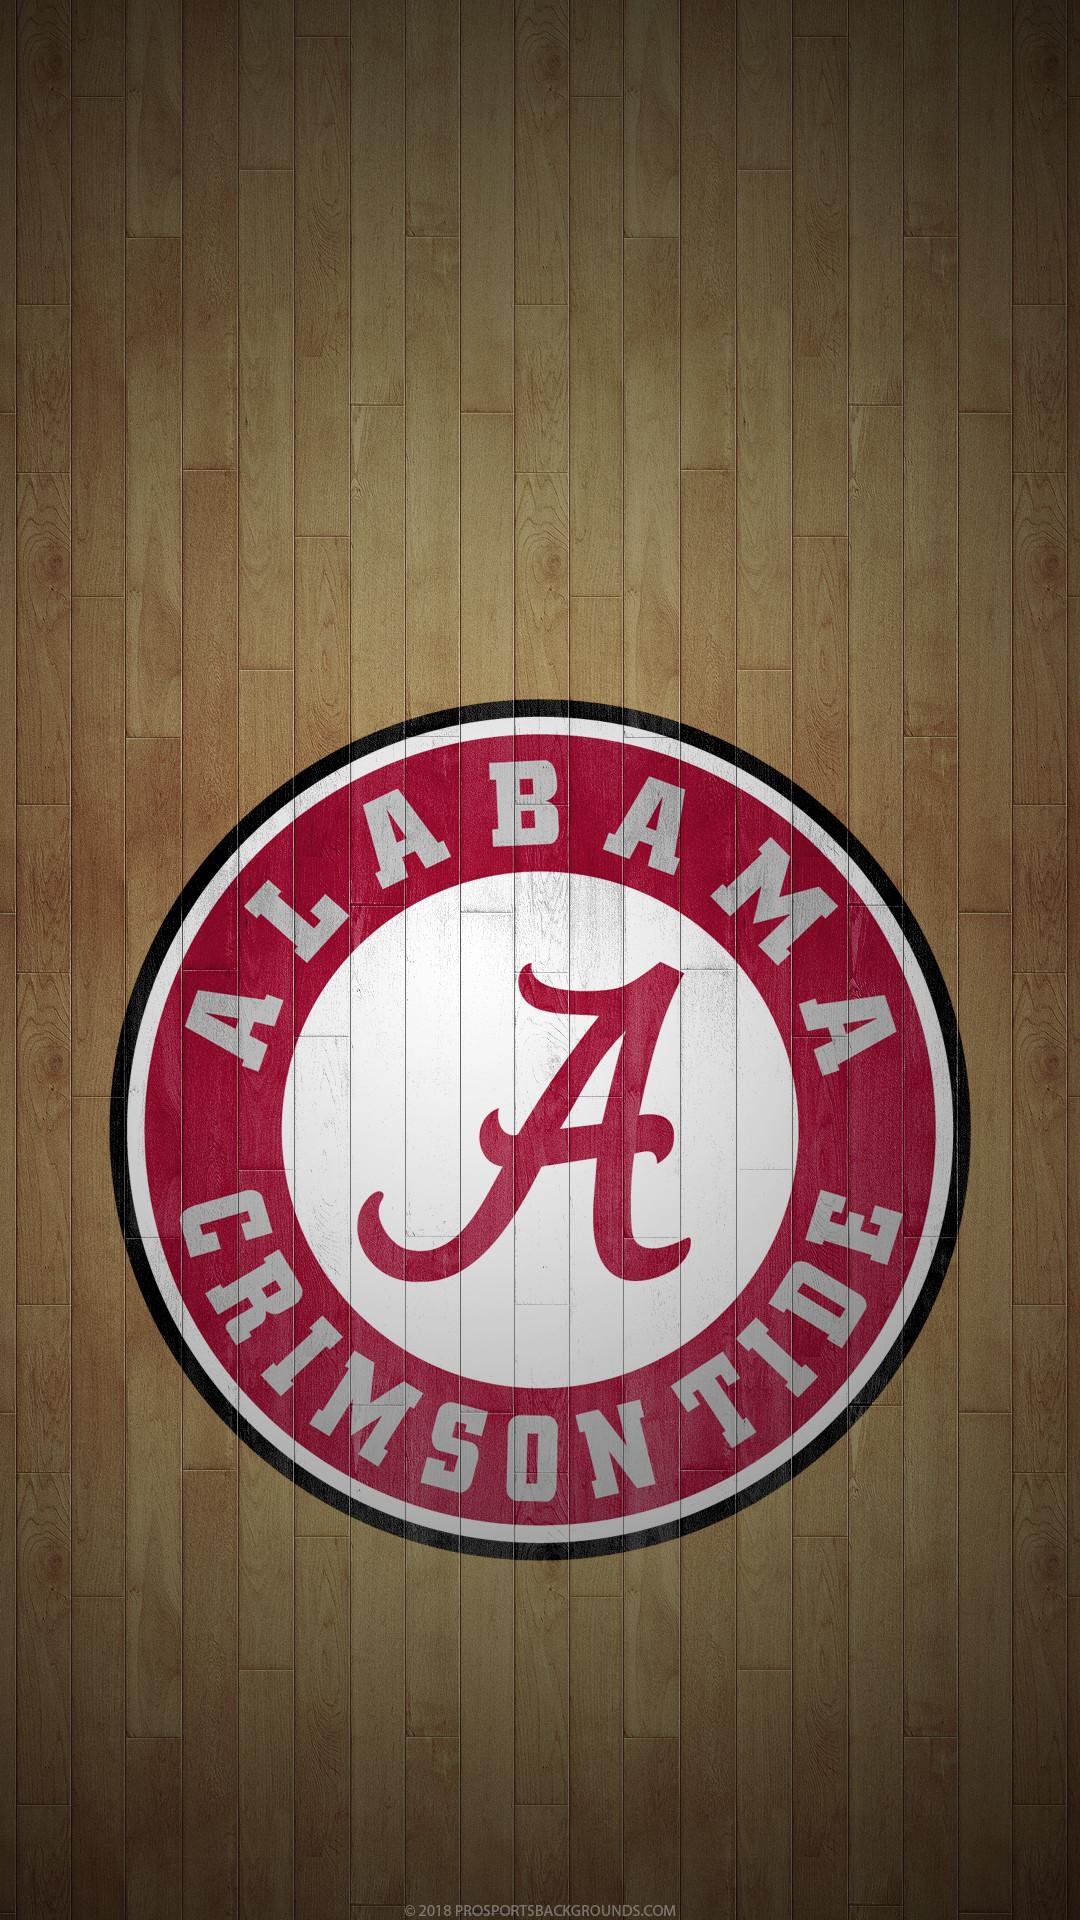 Alabama wallpaper for iphone 62 images - Alabama backgrounds ...